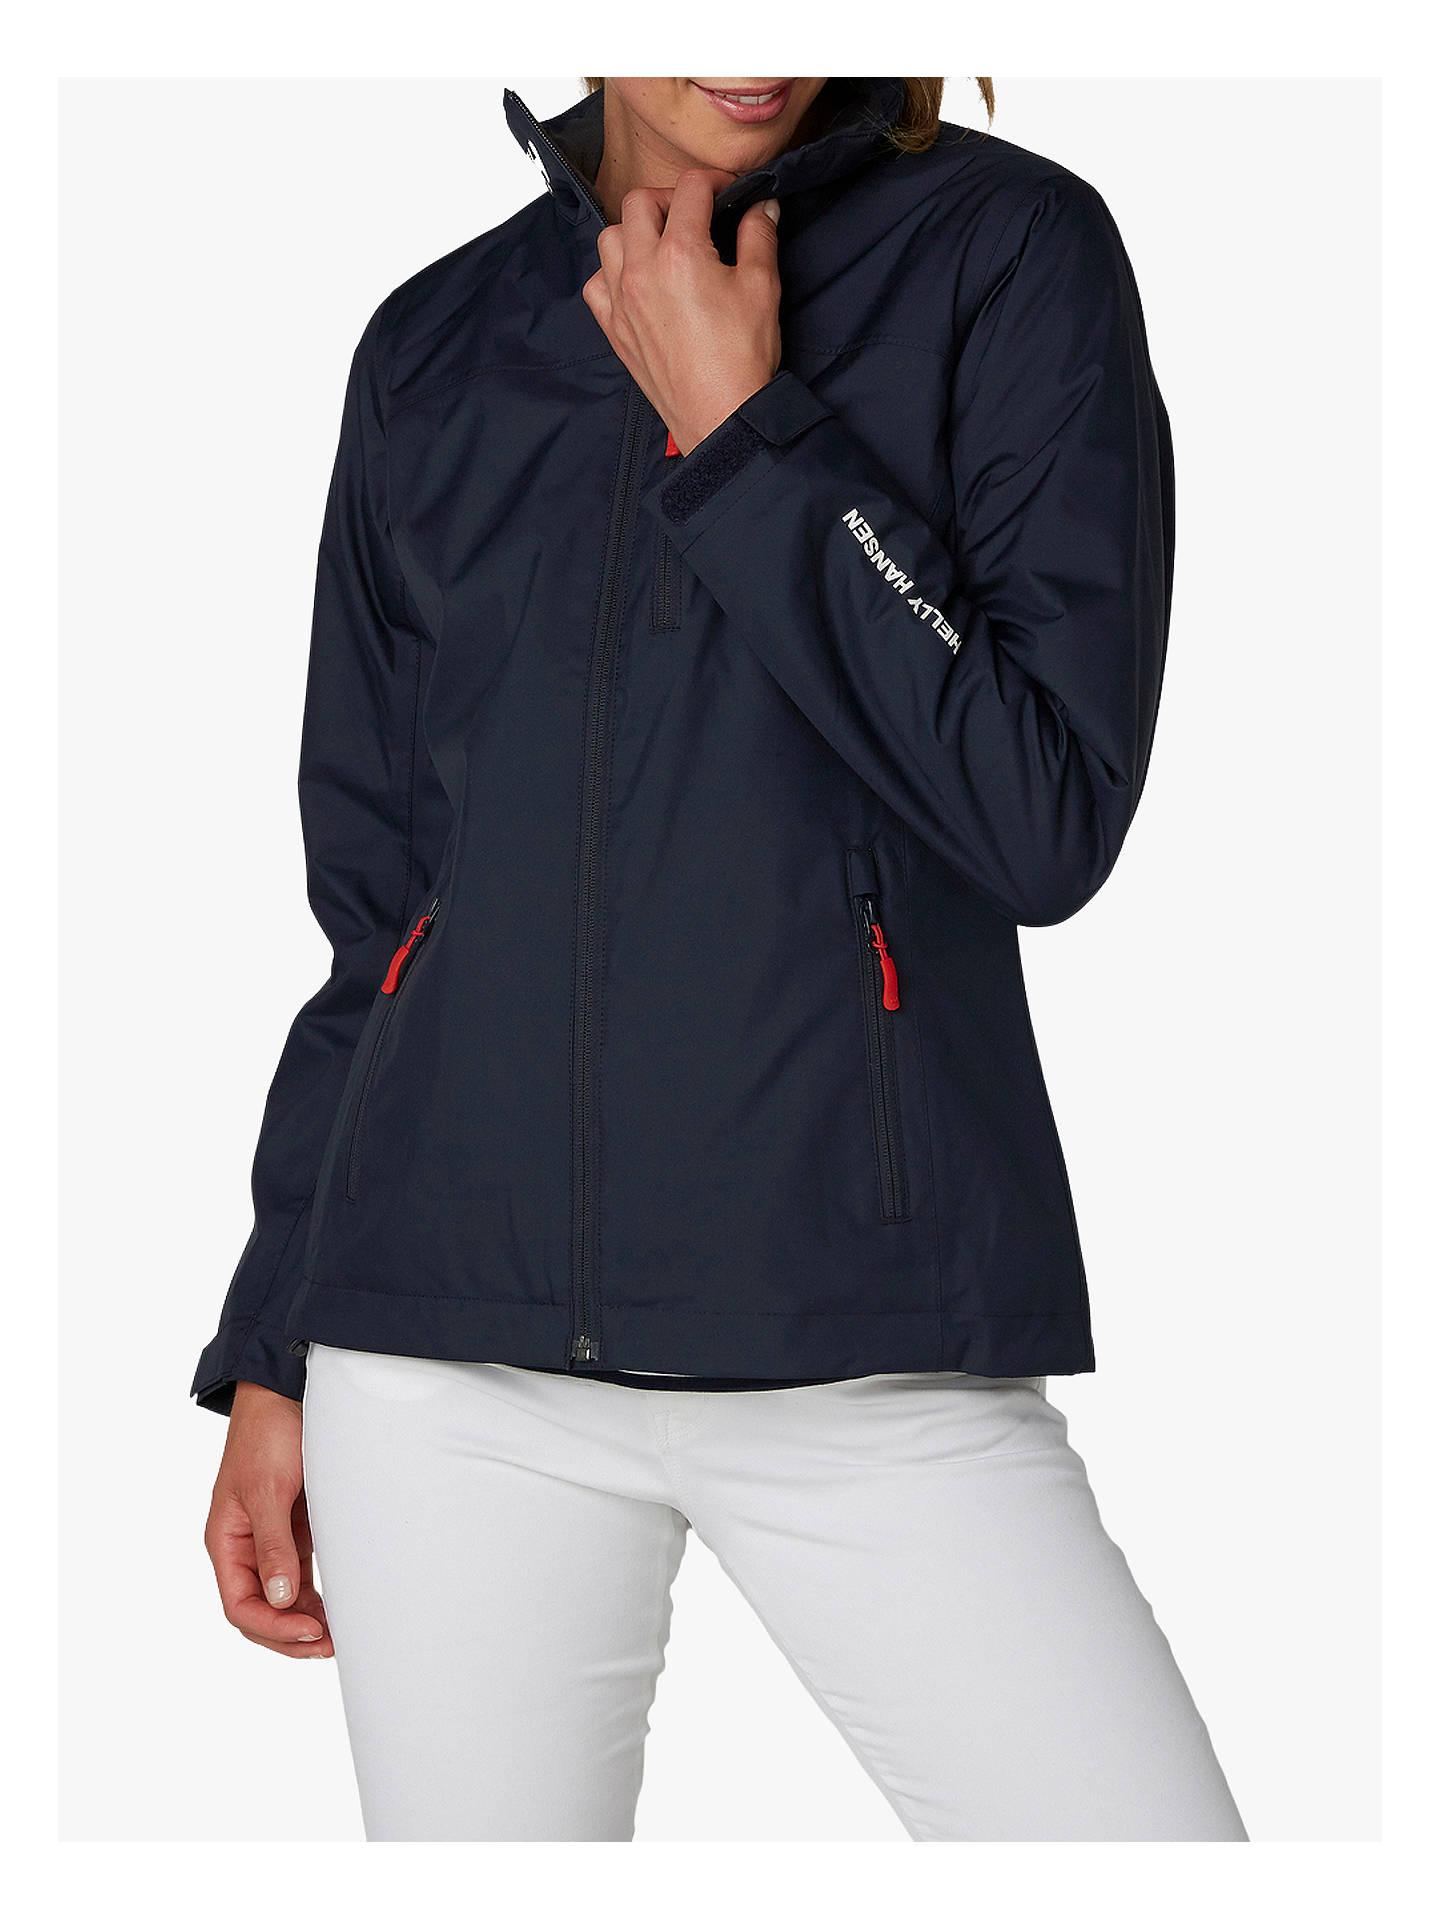 f638485550aaf BuyHelly Hansen Crew Midlayer Waterproof Insulated Women s Jacket